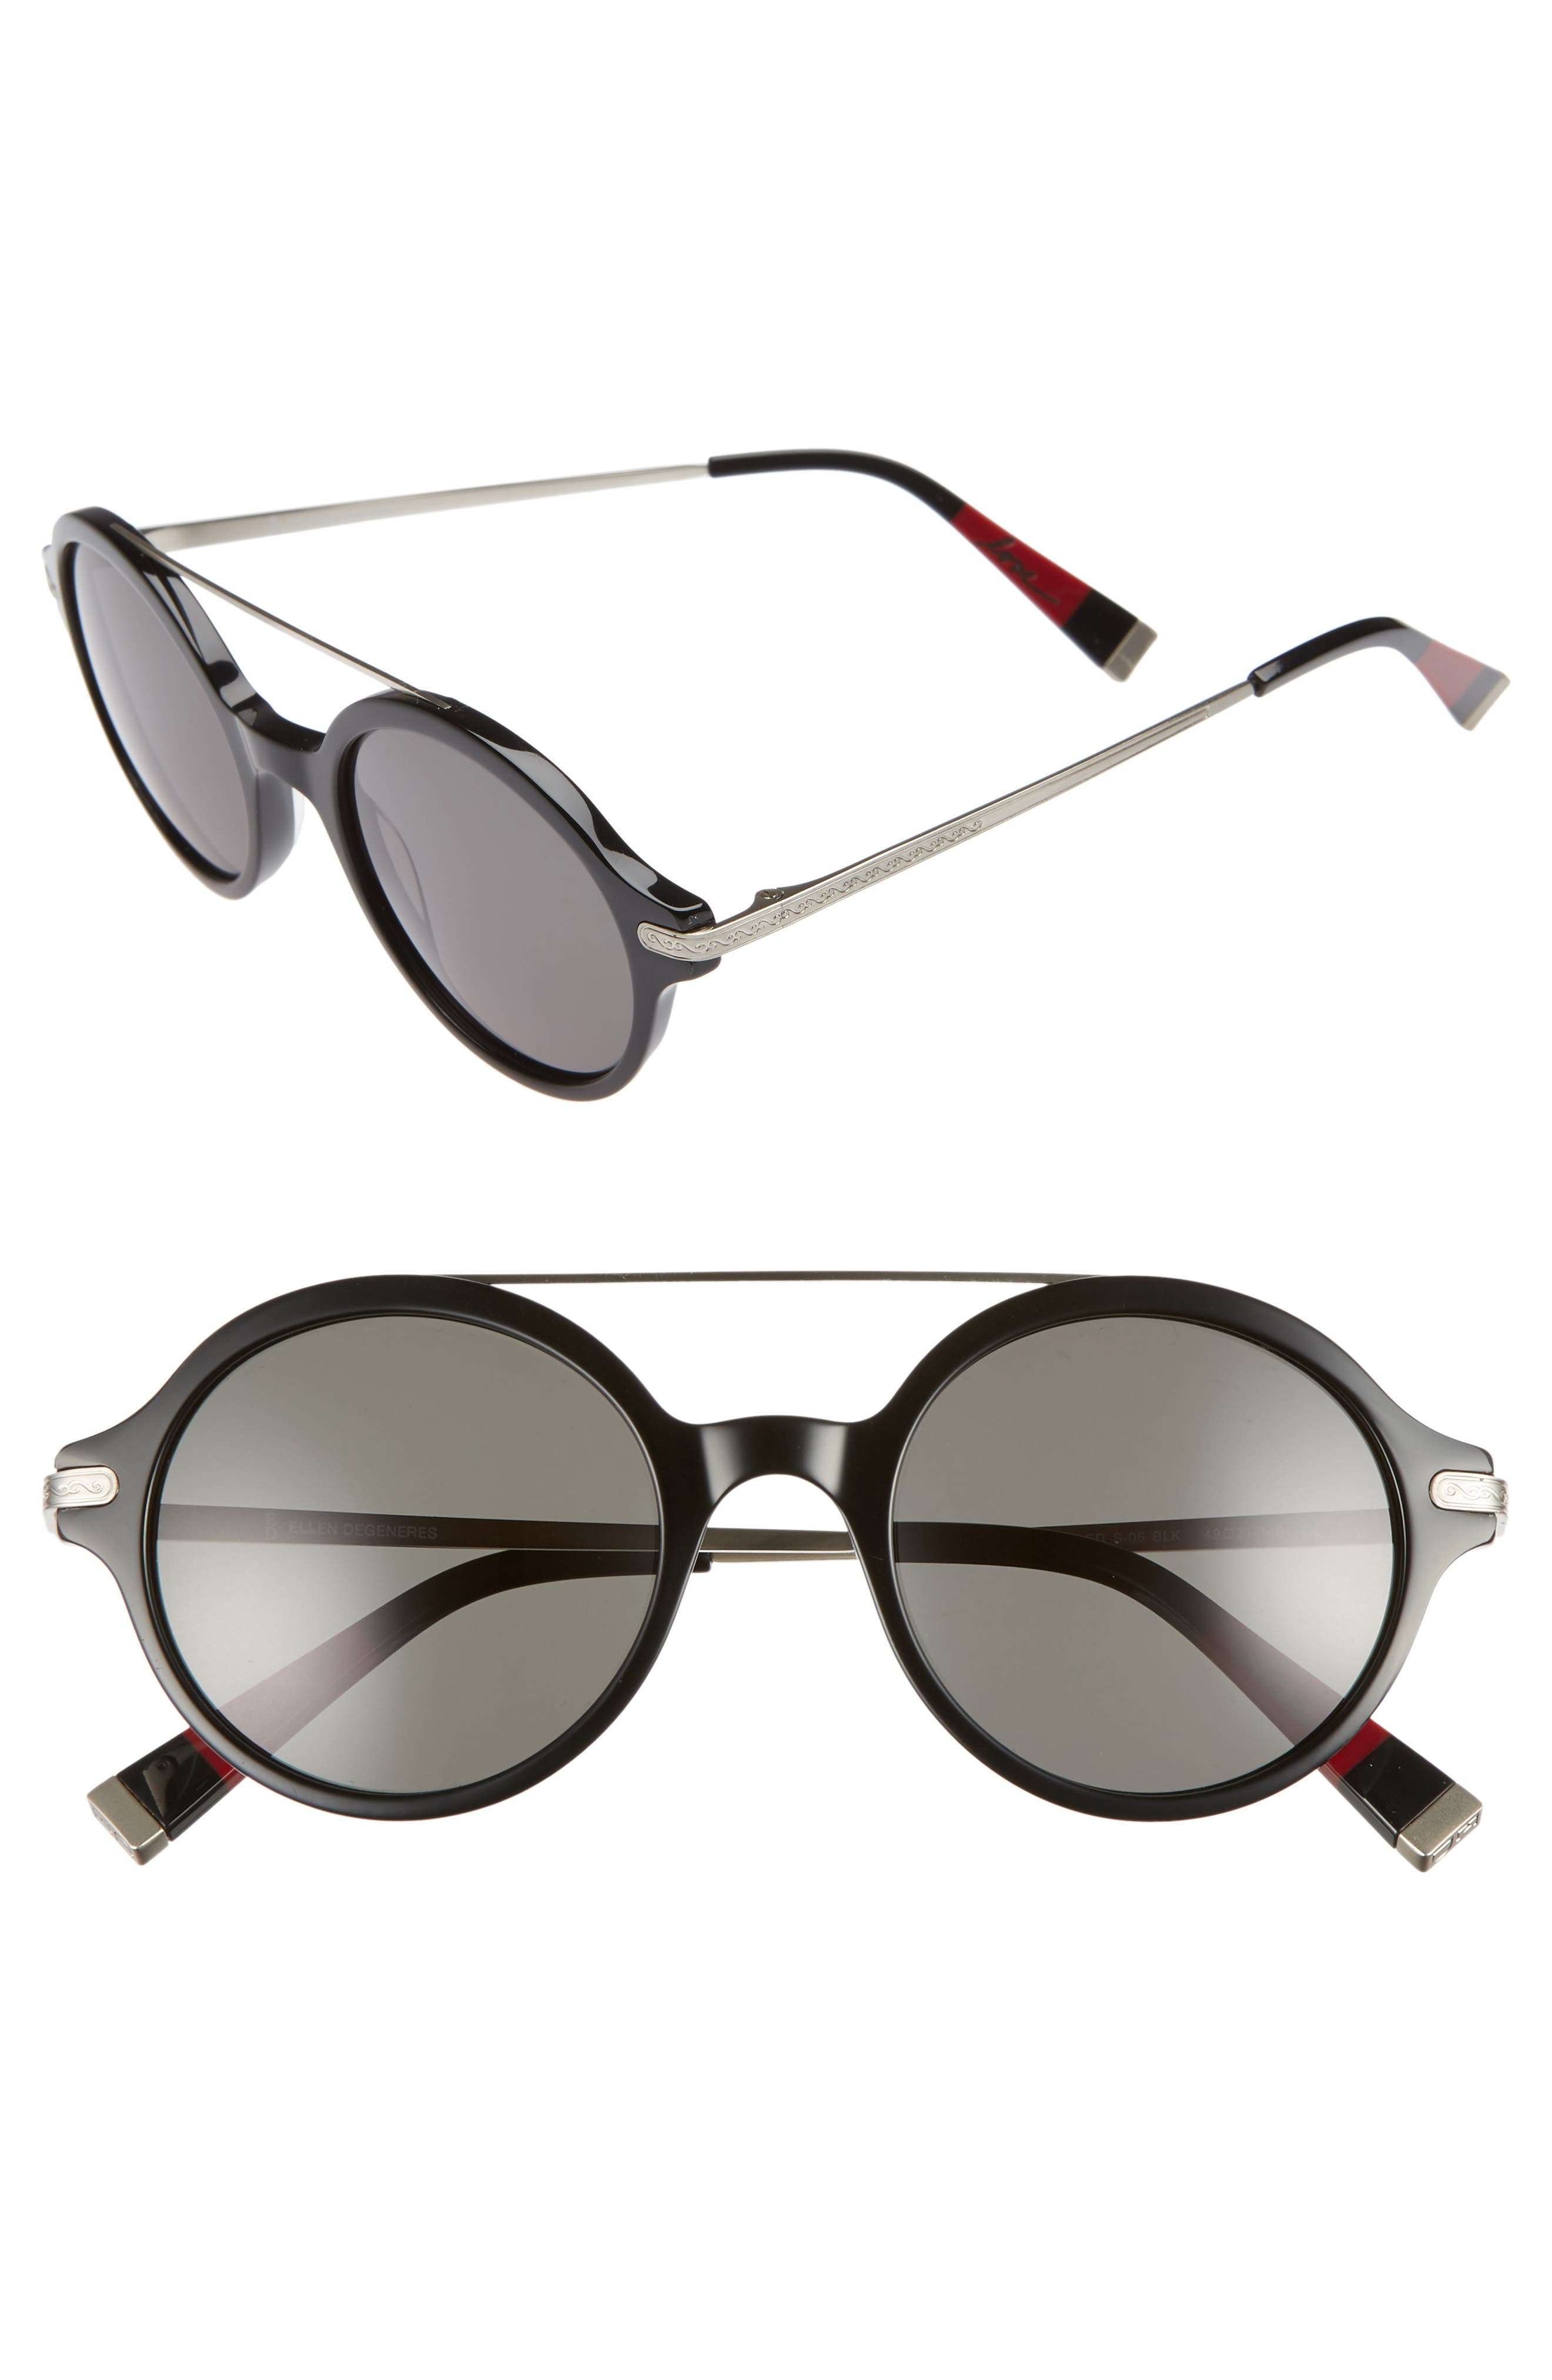 49mm Round Sunglasses,                         Main,                         color, BLACK